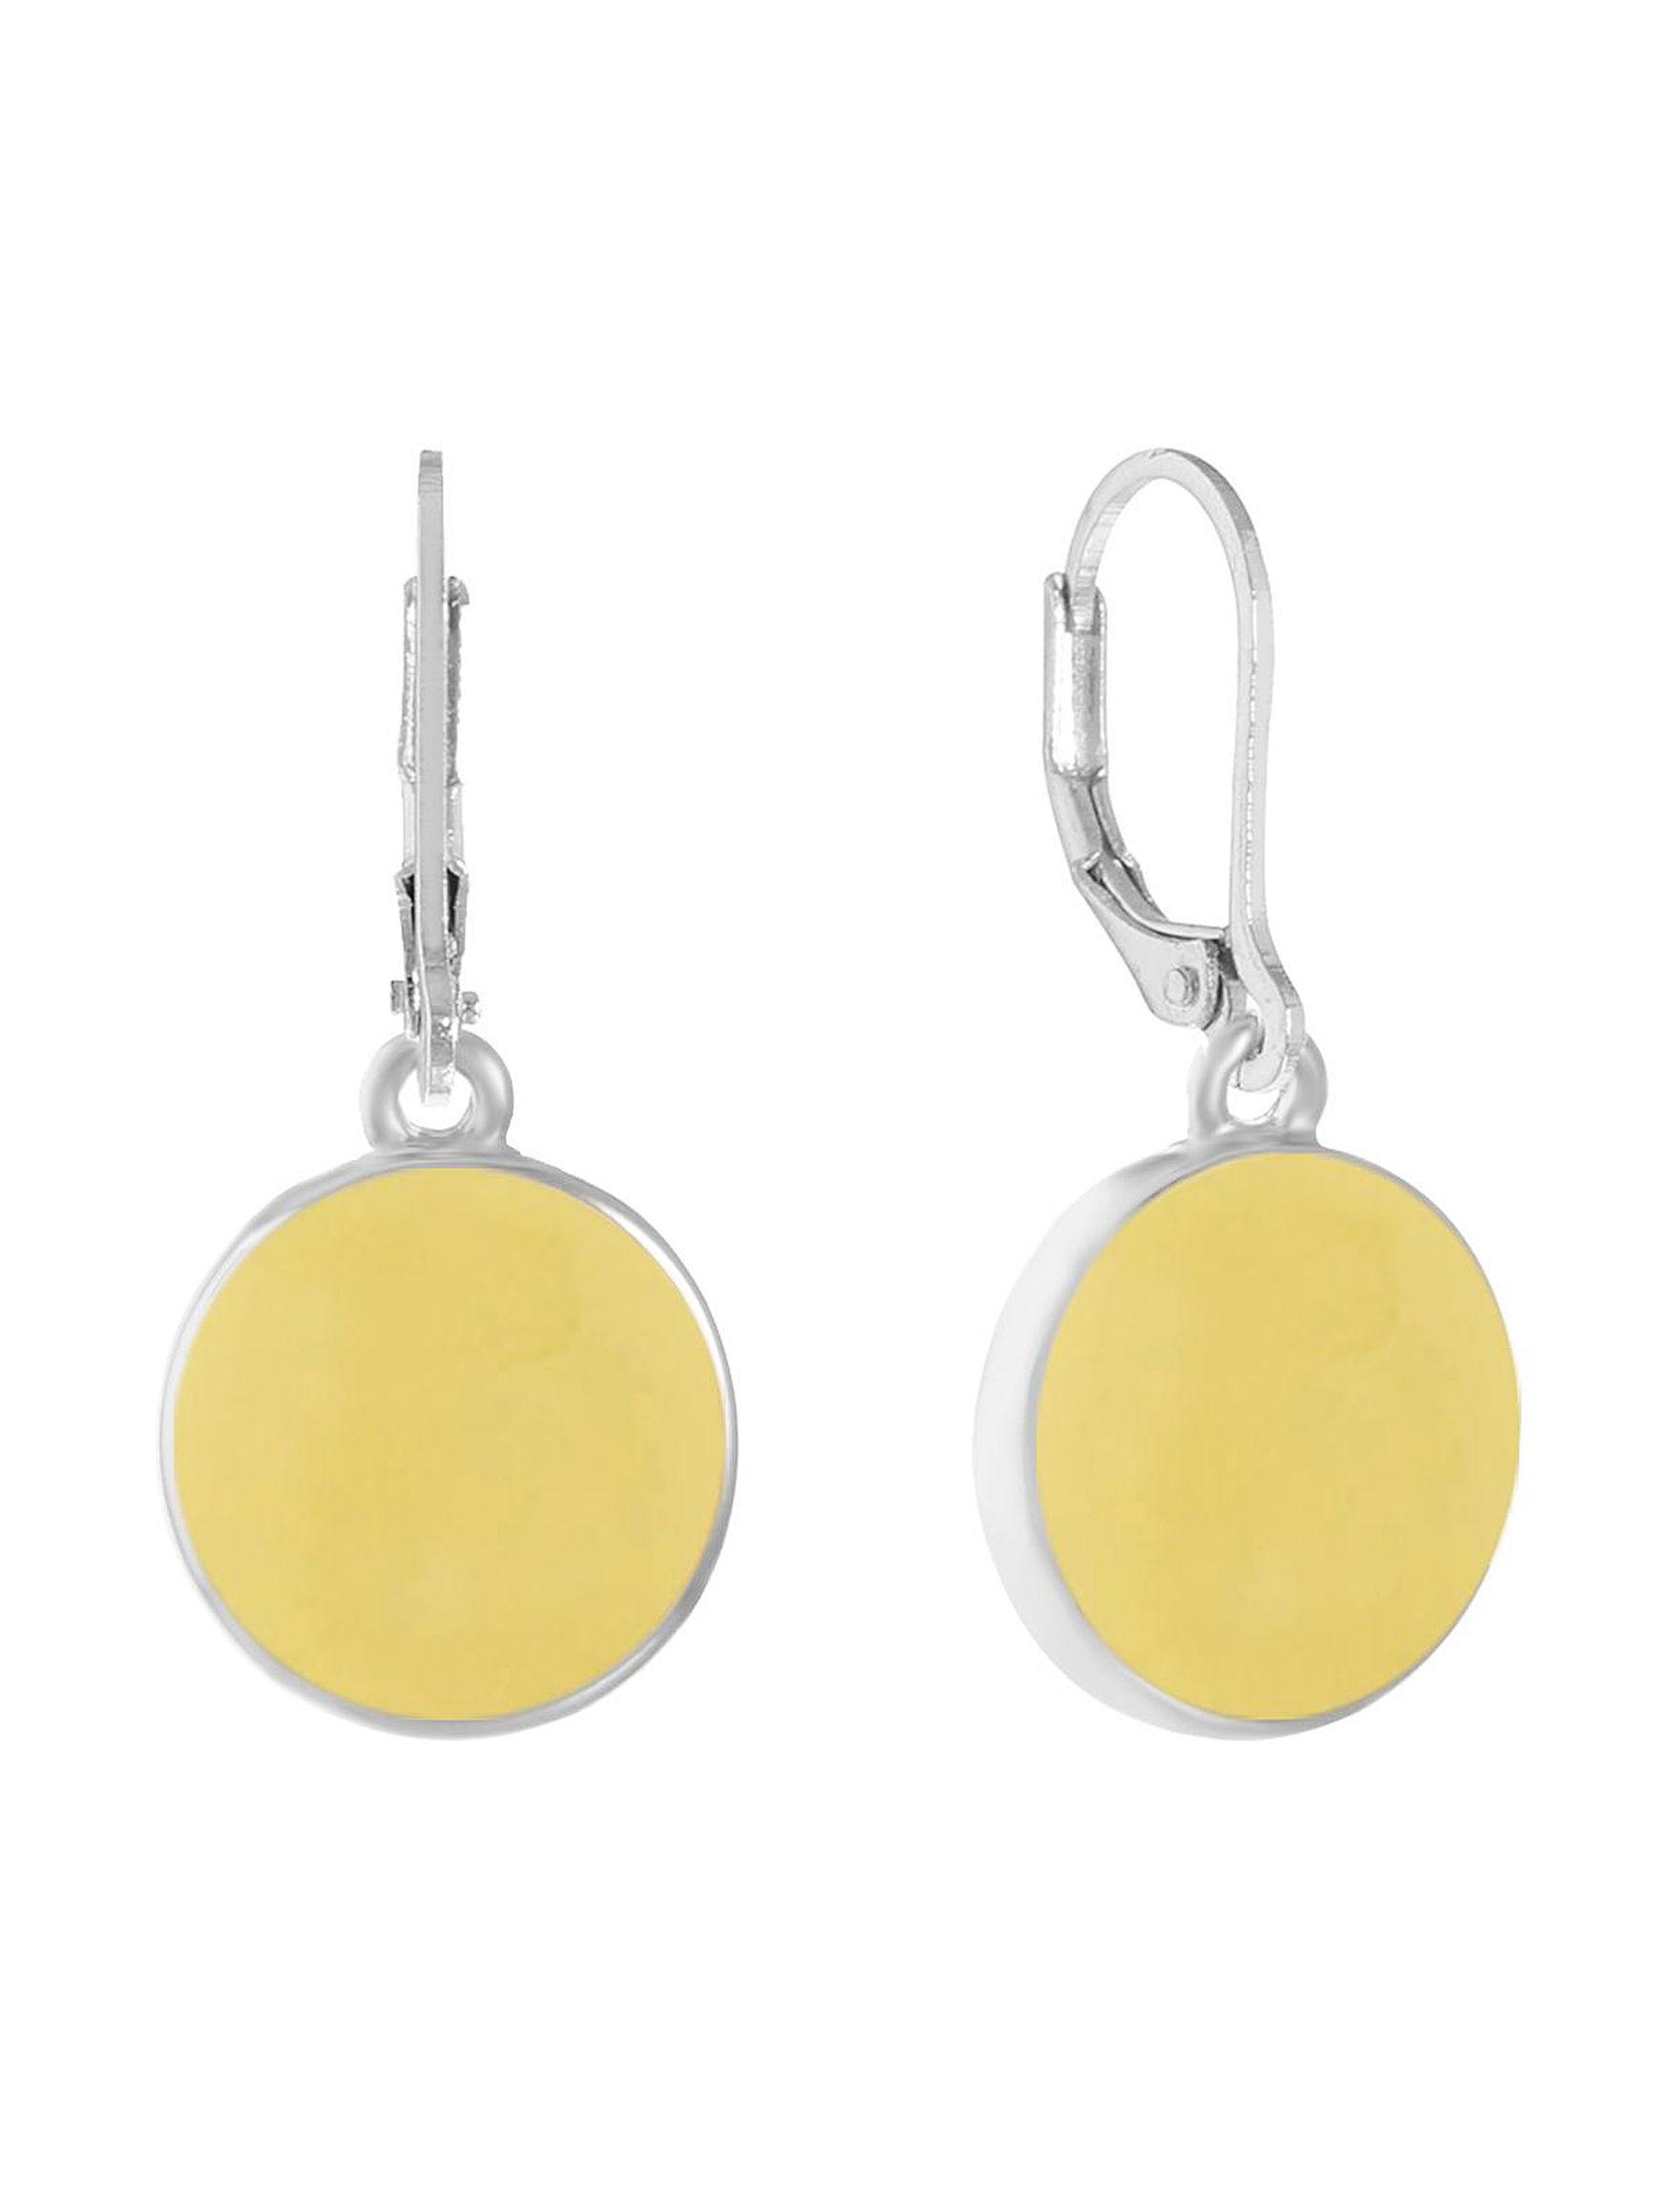 Gloria Vanderbilt Yellow / Silver Drops Earrings Fashion Jewelry